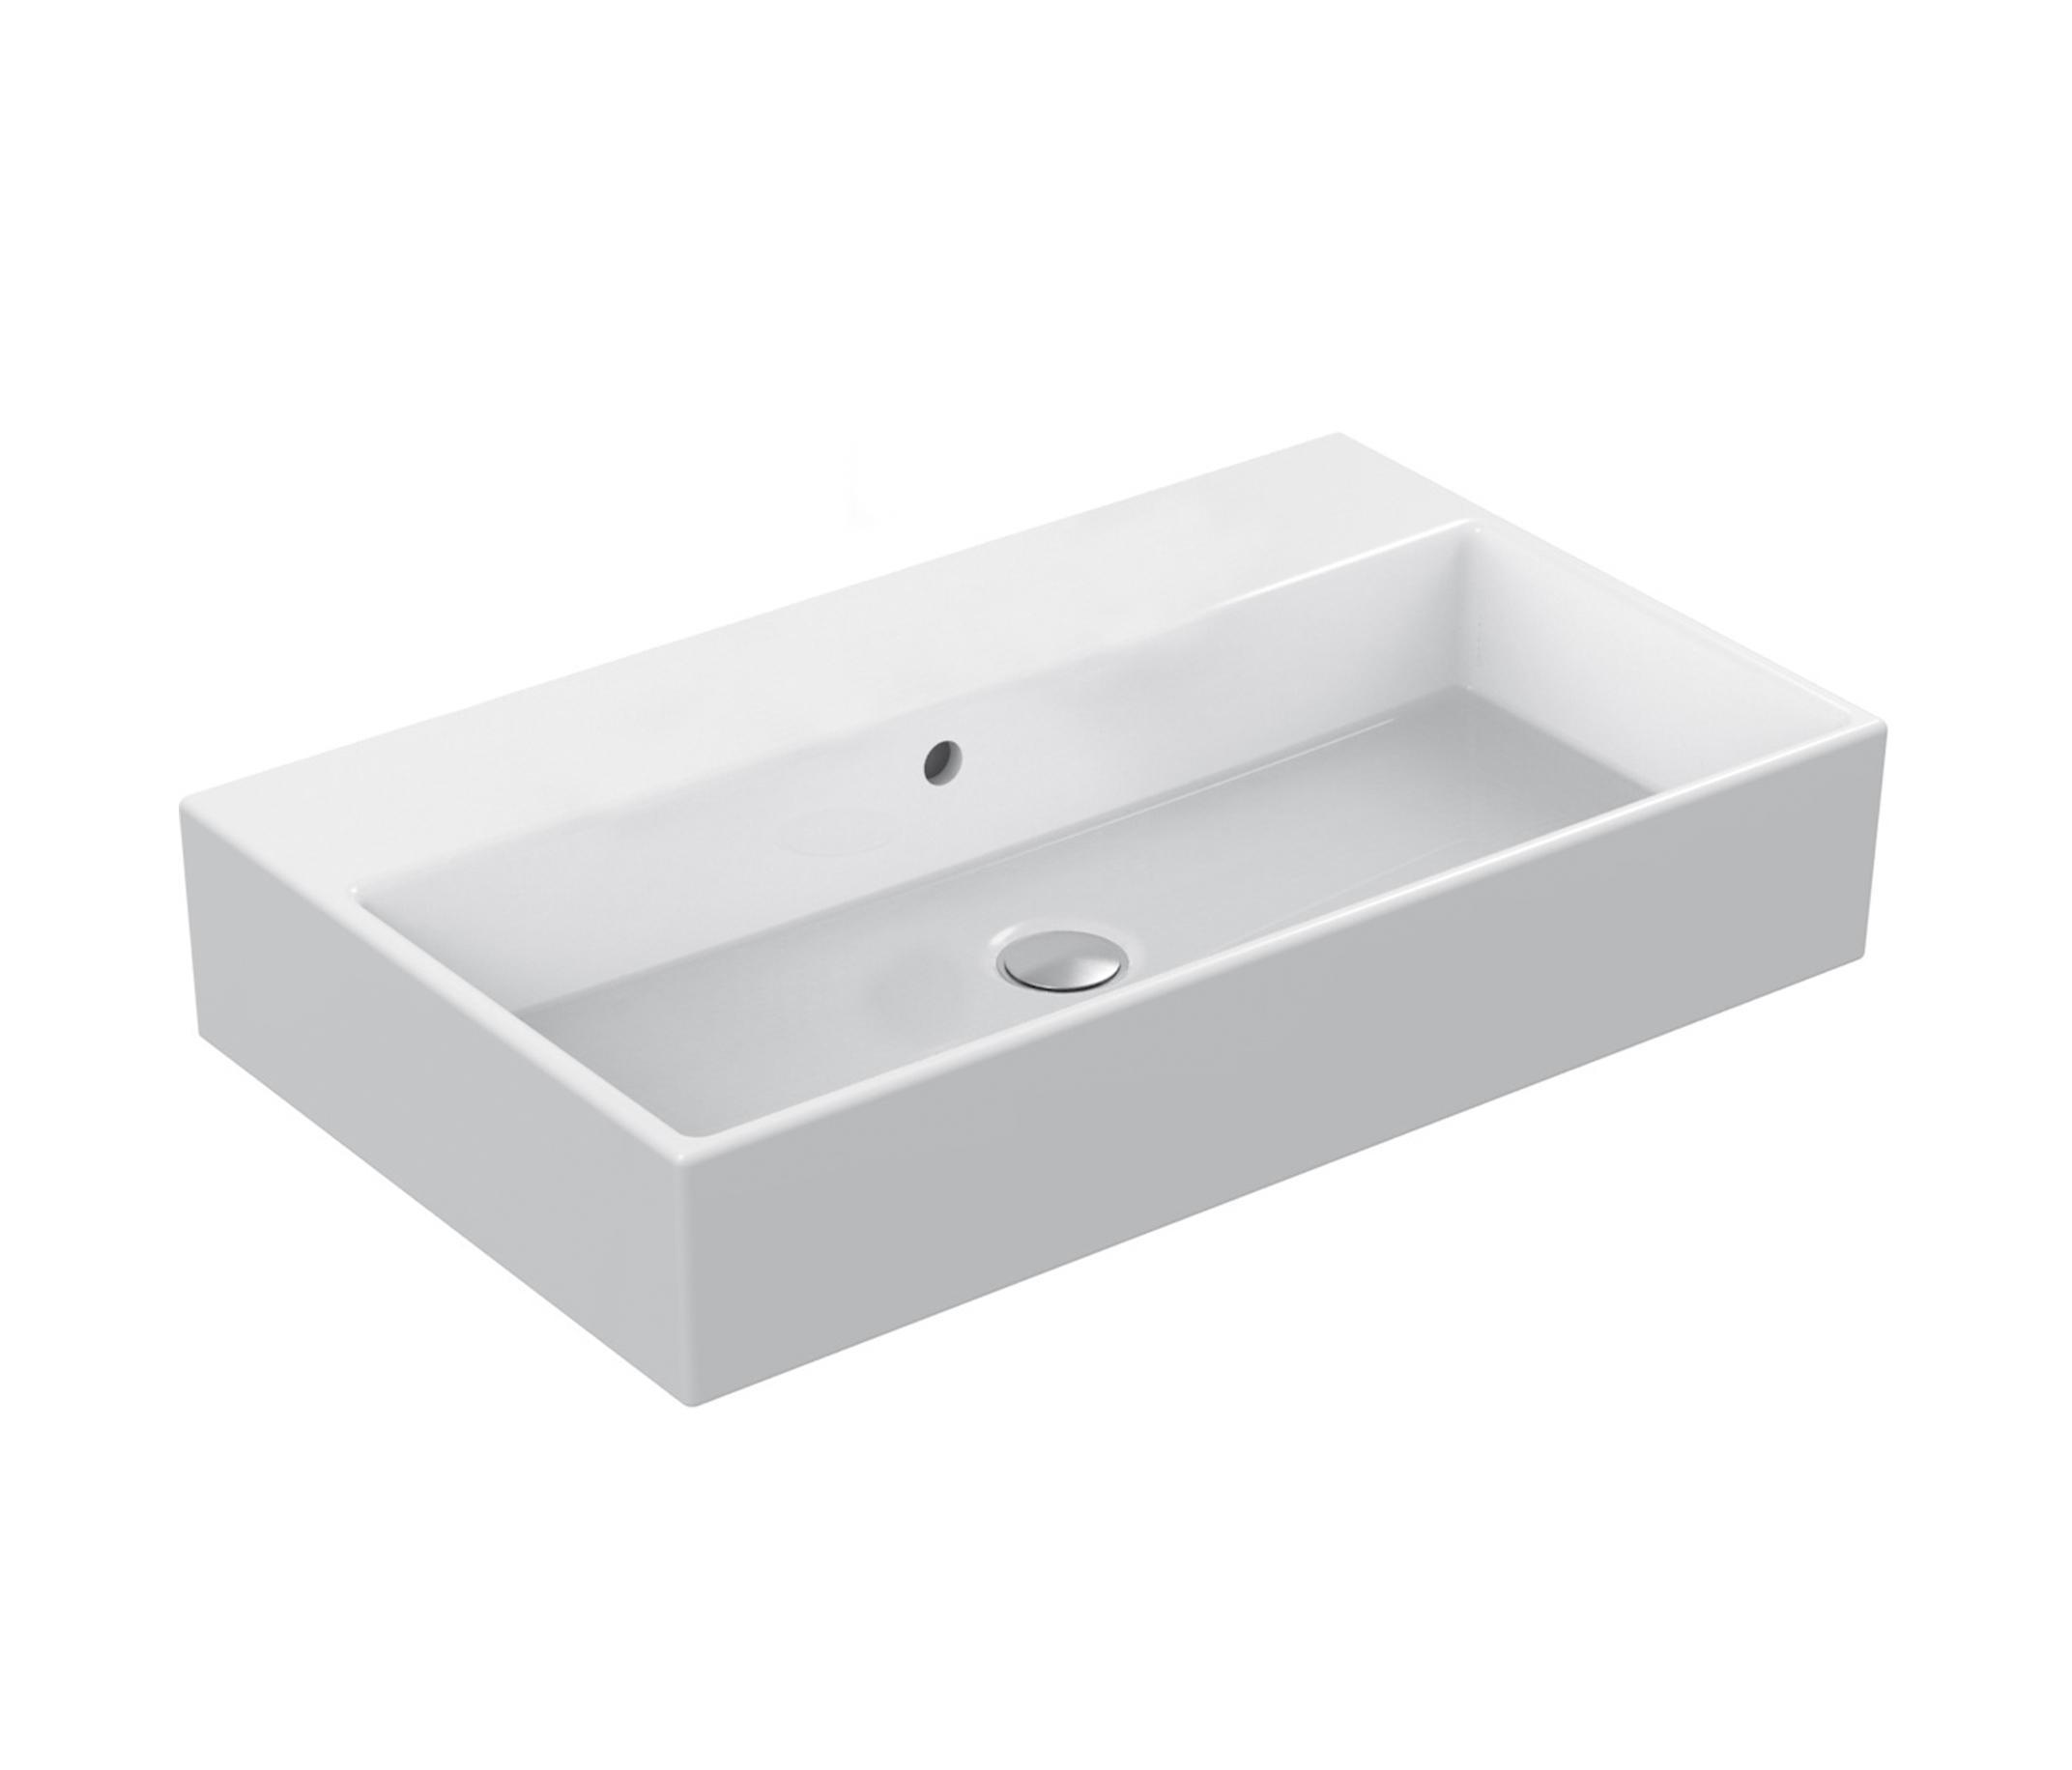 strada waschtisch 710mm ohne hahnloch wash basins from ideal standard architonic. Black Bedroom Furniture Sets. Home Design Ideas